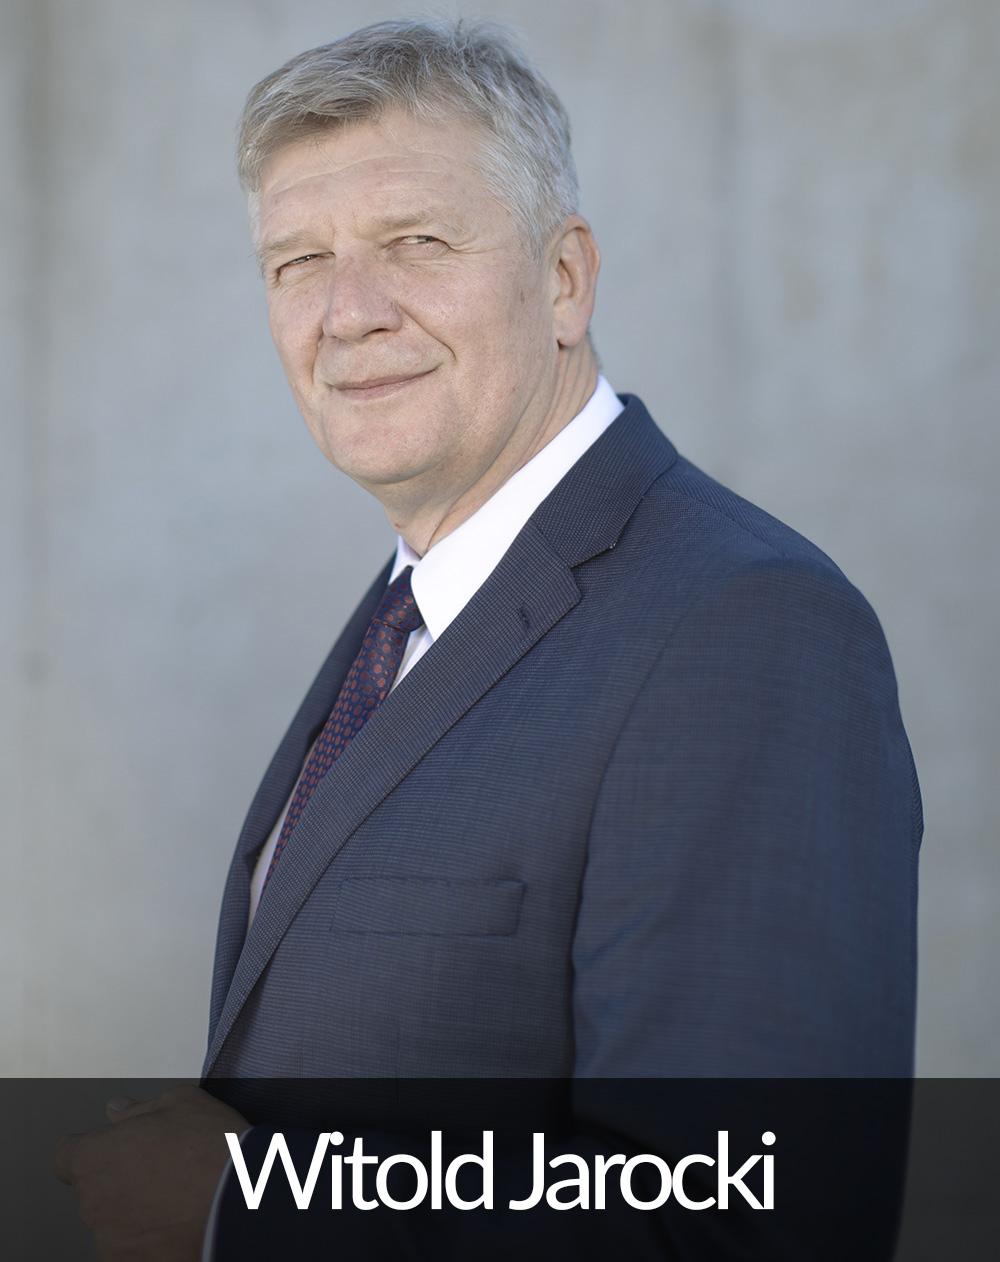 Witold Jarocki